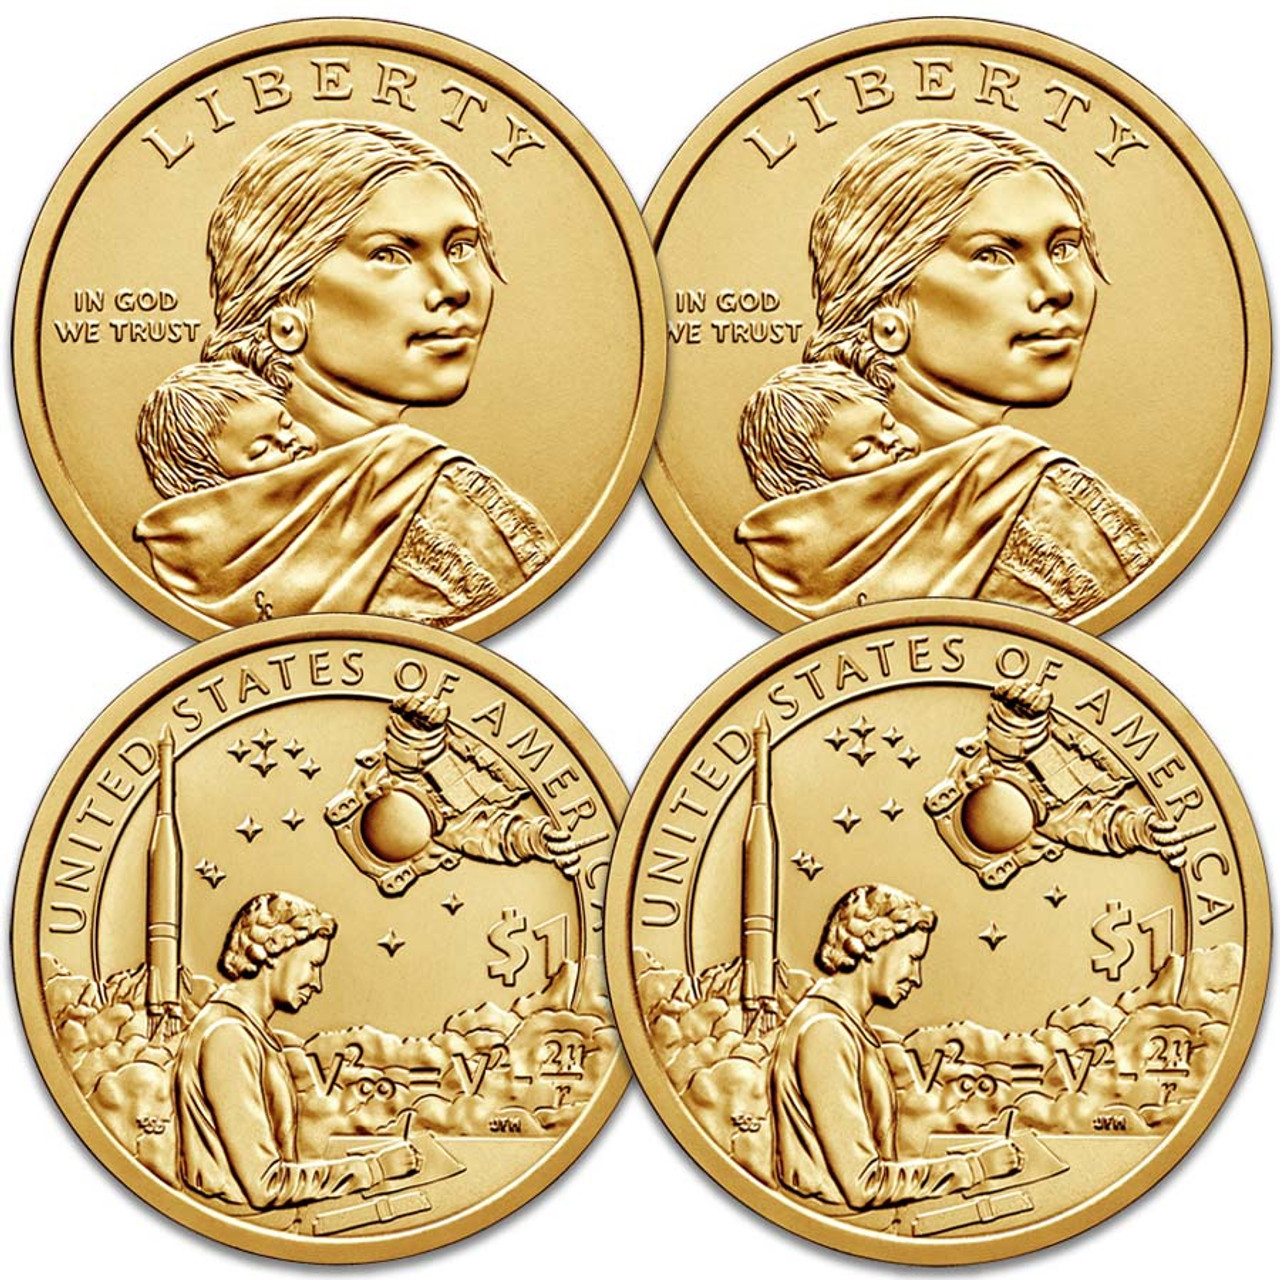 2019 P & D Native American Dollar Pair Brilliant Uncirculated Image 1